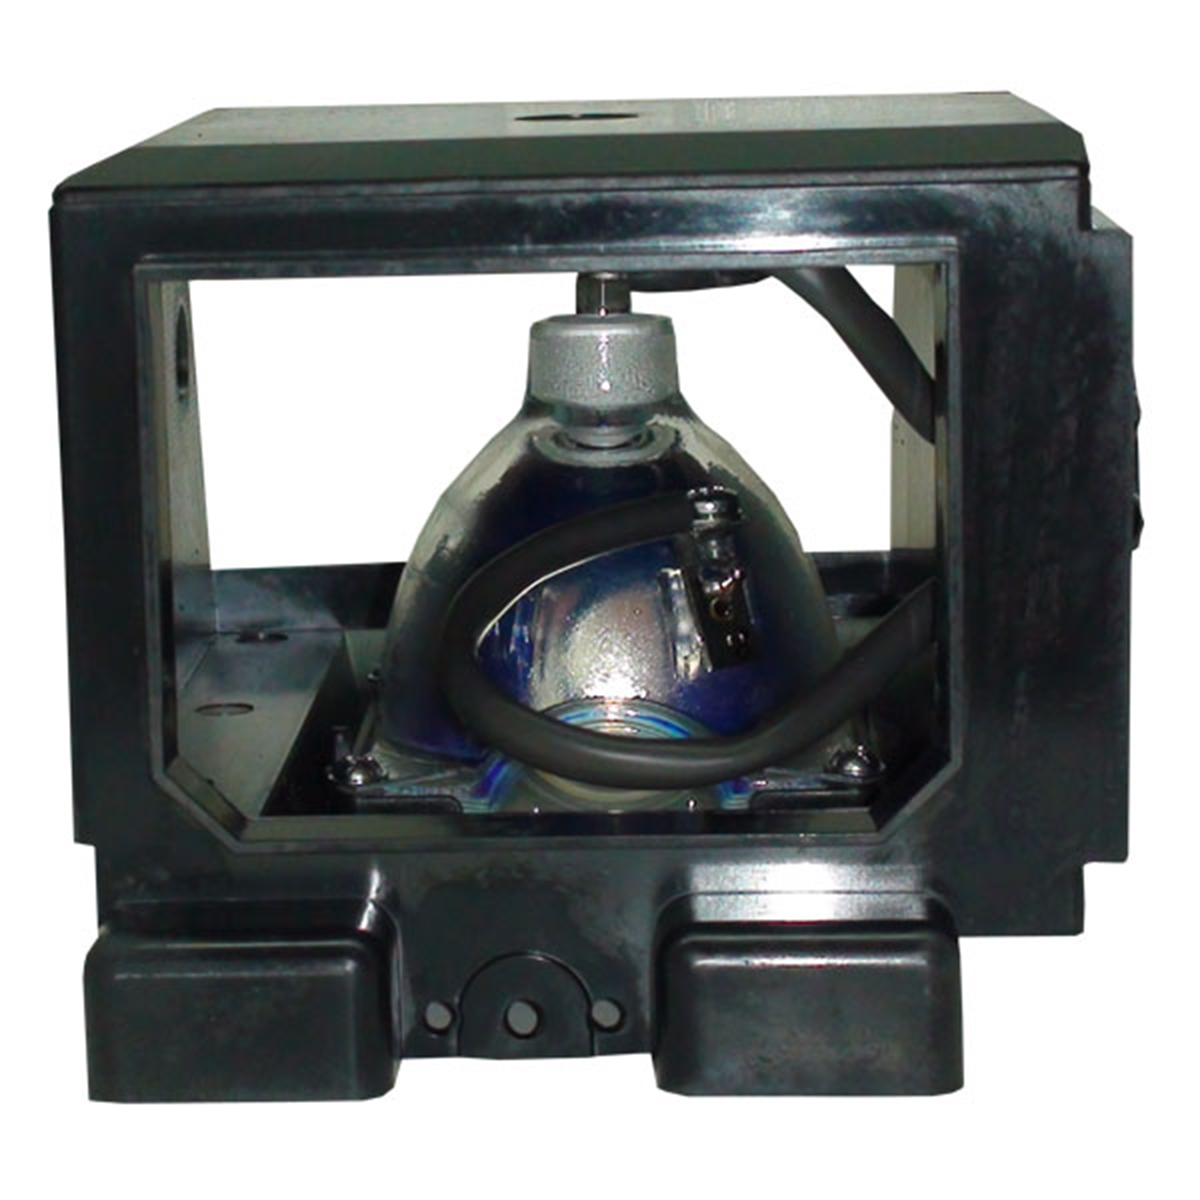 Lutema Platinum for Samsung HLP5063WX/XA TV Lamp with Housing (Original Philips Bulb Inside) - image 1 of 5